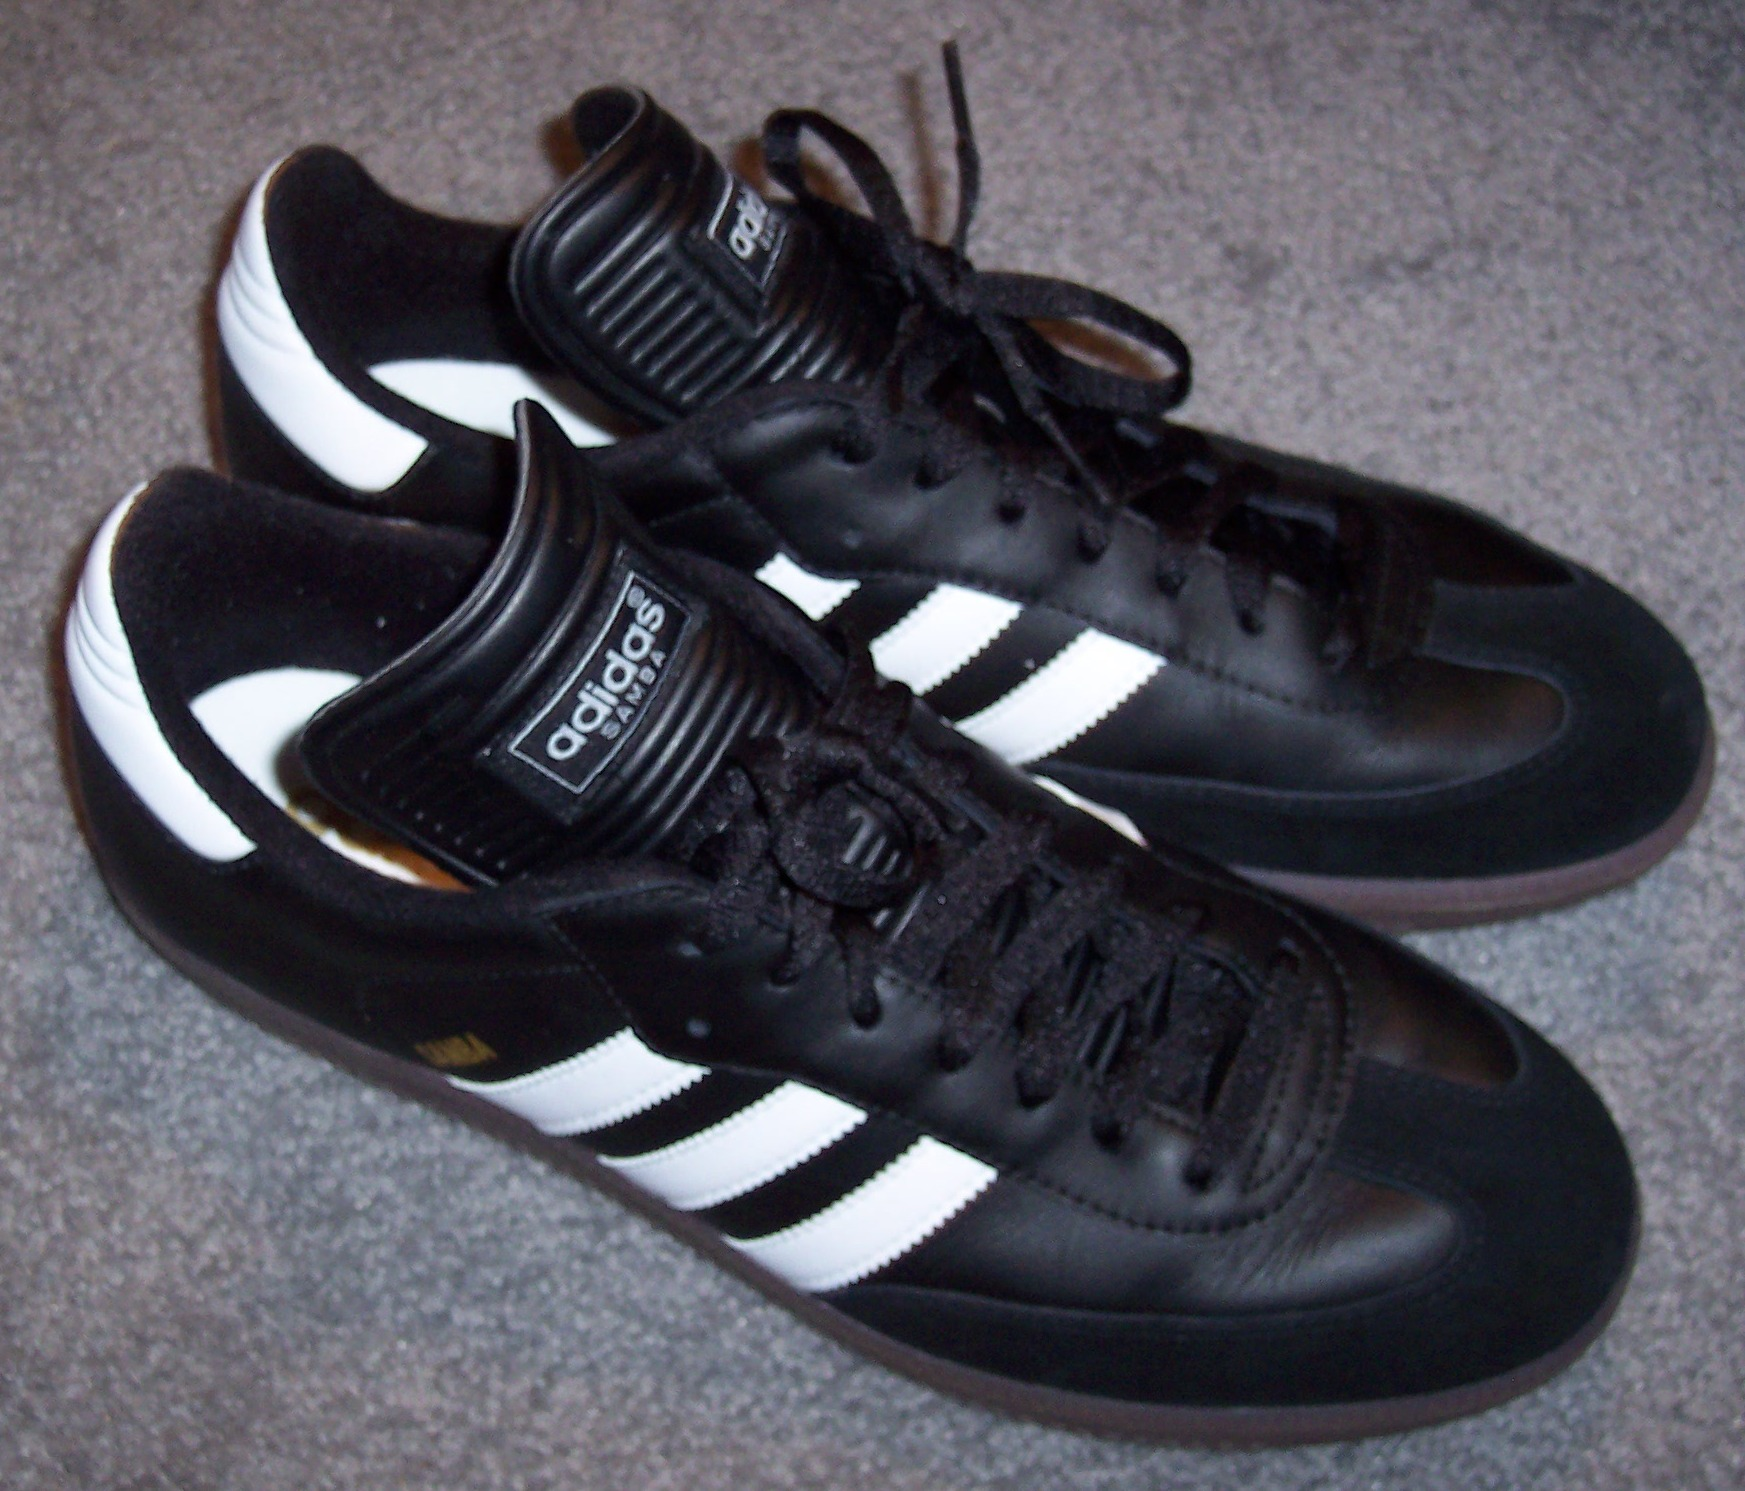 Adidas Originals Shoes Australia